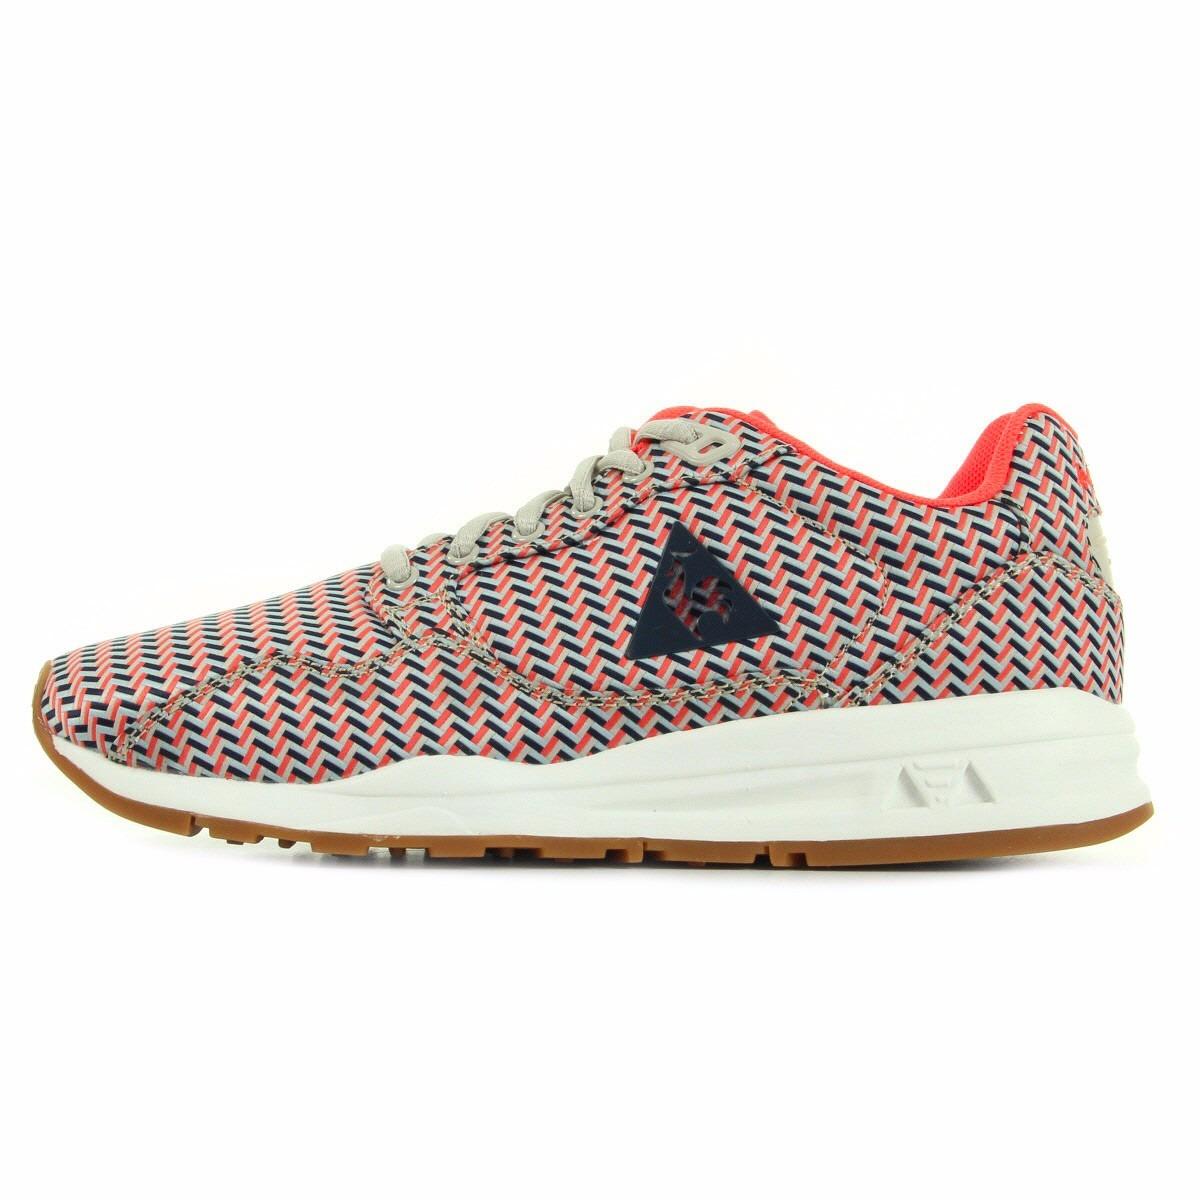 45588b3c7a8 Tenis Zapatos Mujer Le Coq Sportif Lcs R900 W 1620212 -   462.000 en ...